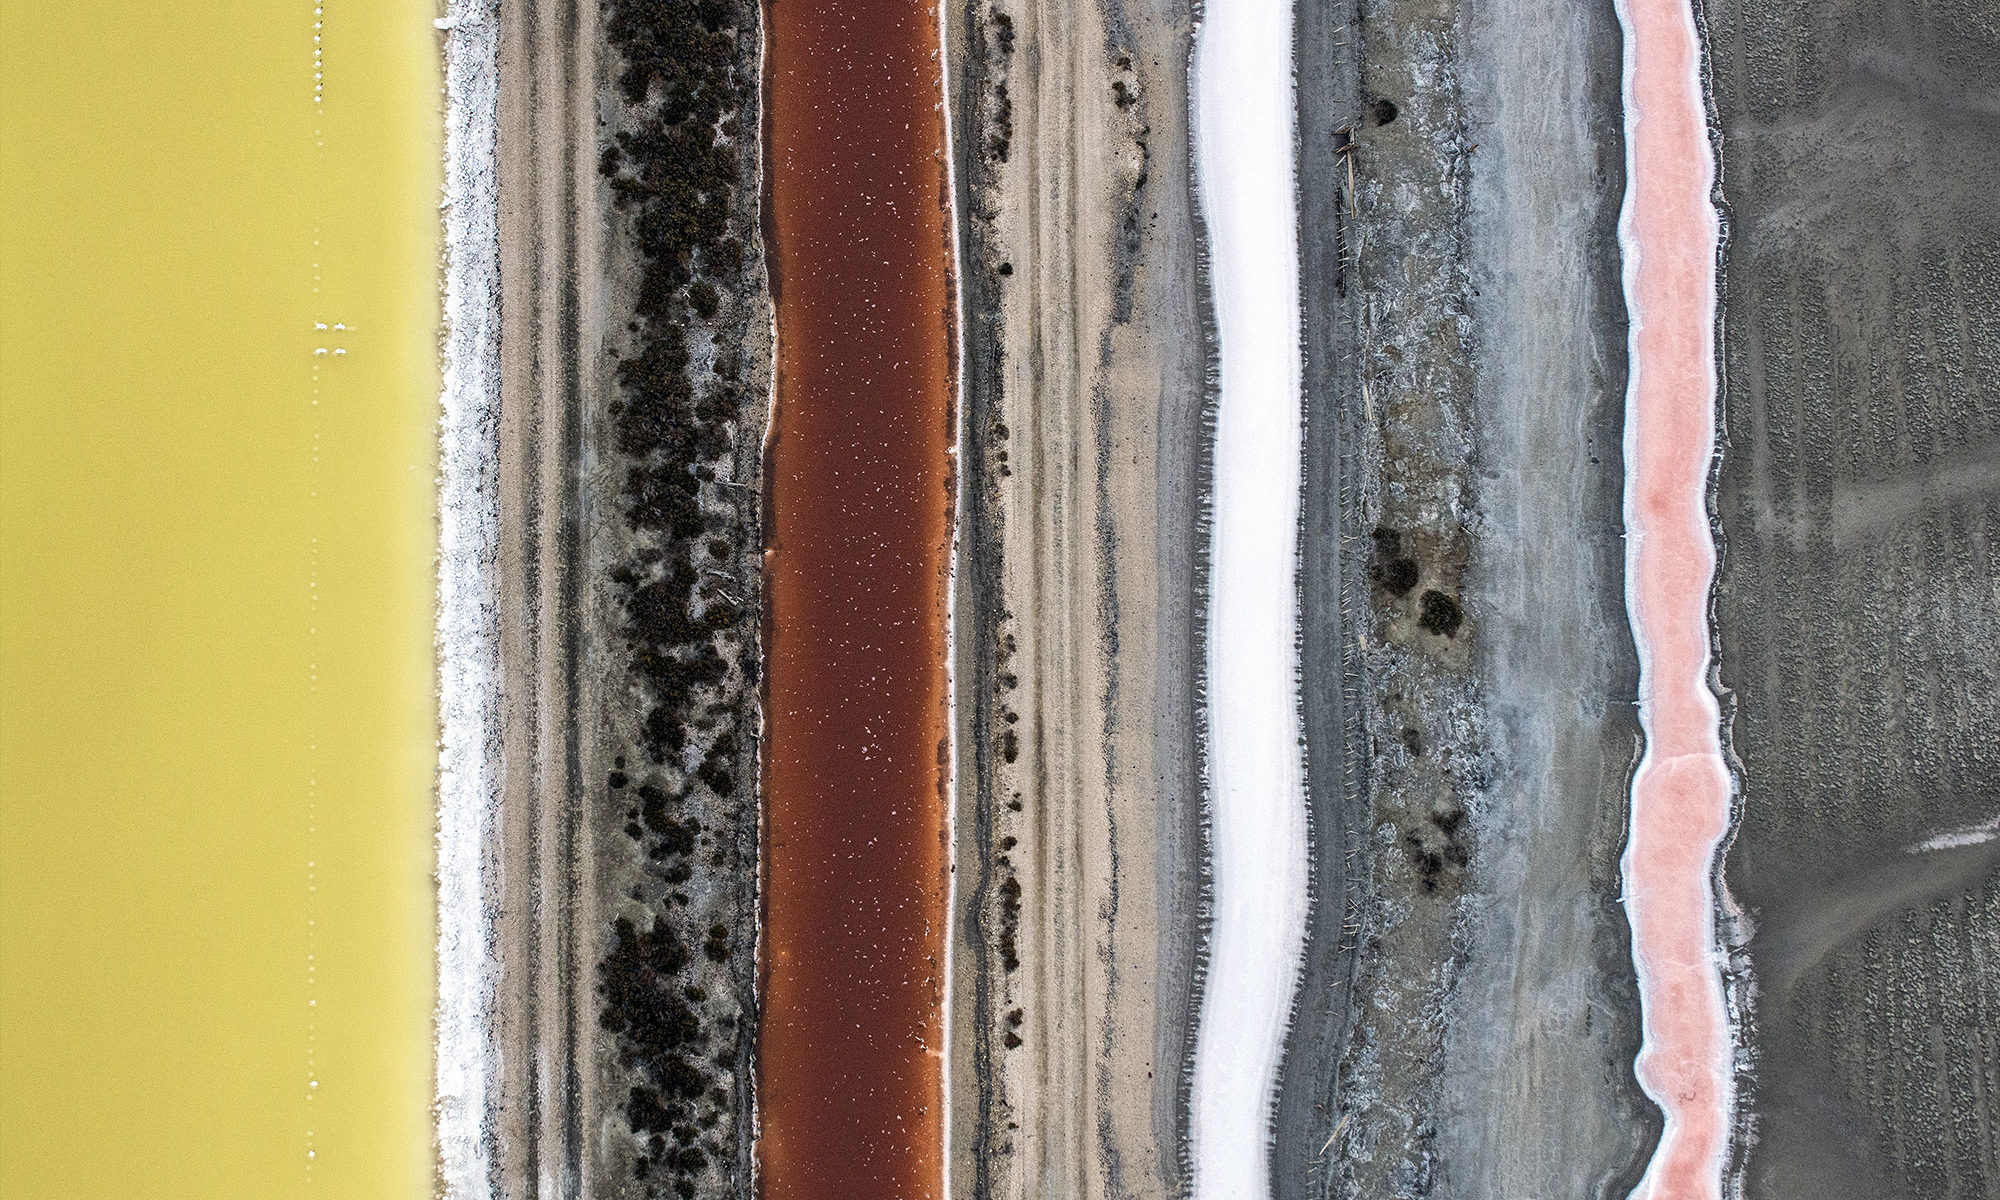 Grain de sel - Thierry Vezon - De natura rerum 2021